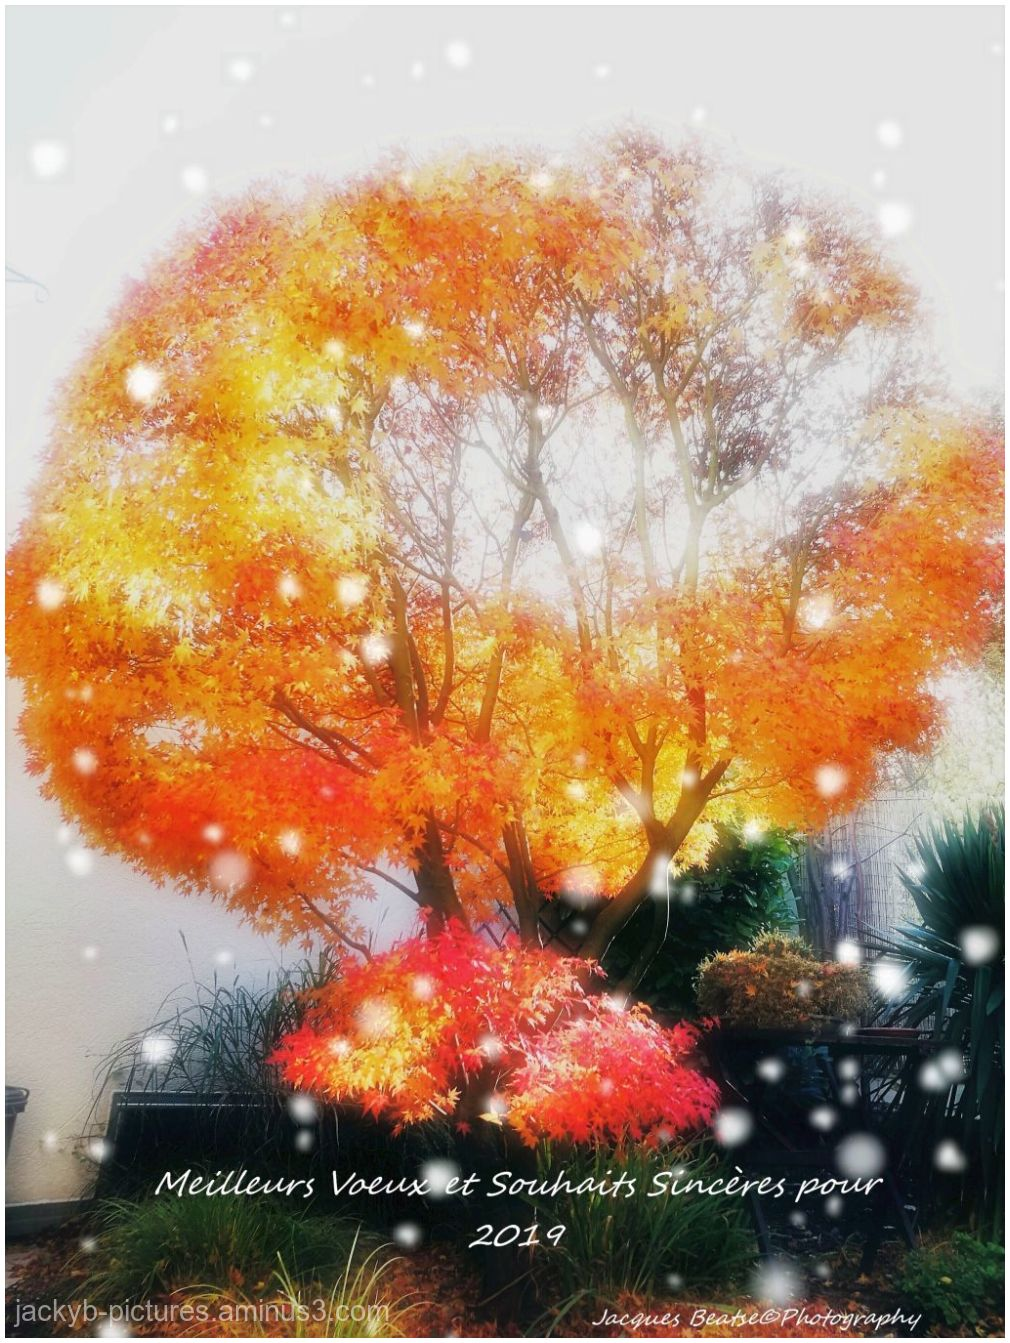 Merry Christmas & Happy New Year 2019  ♥